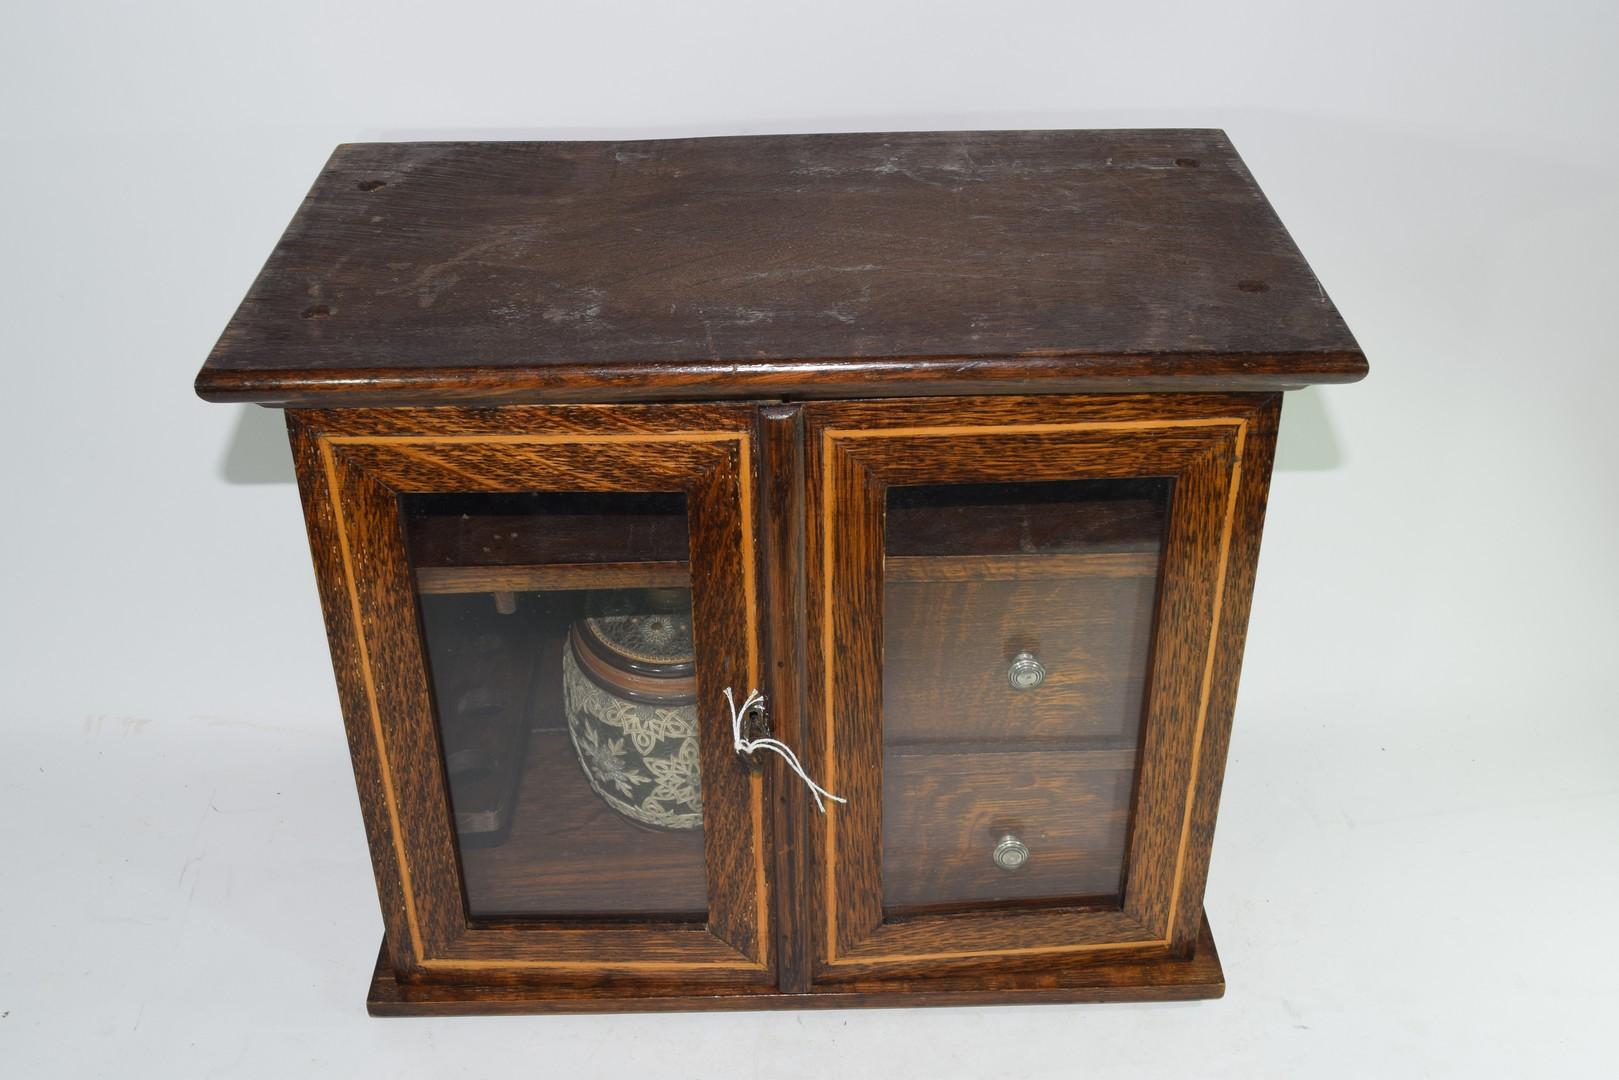 Late 19th century oak smokers cabinet